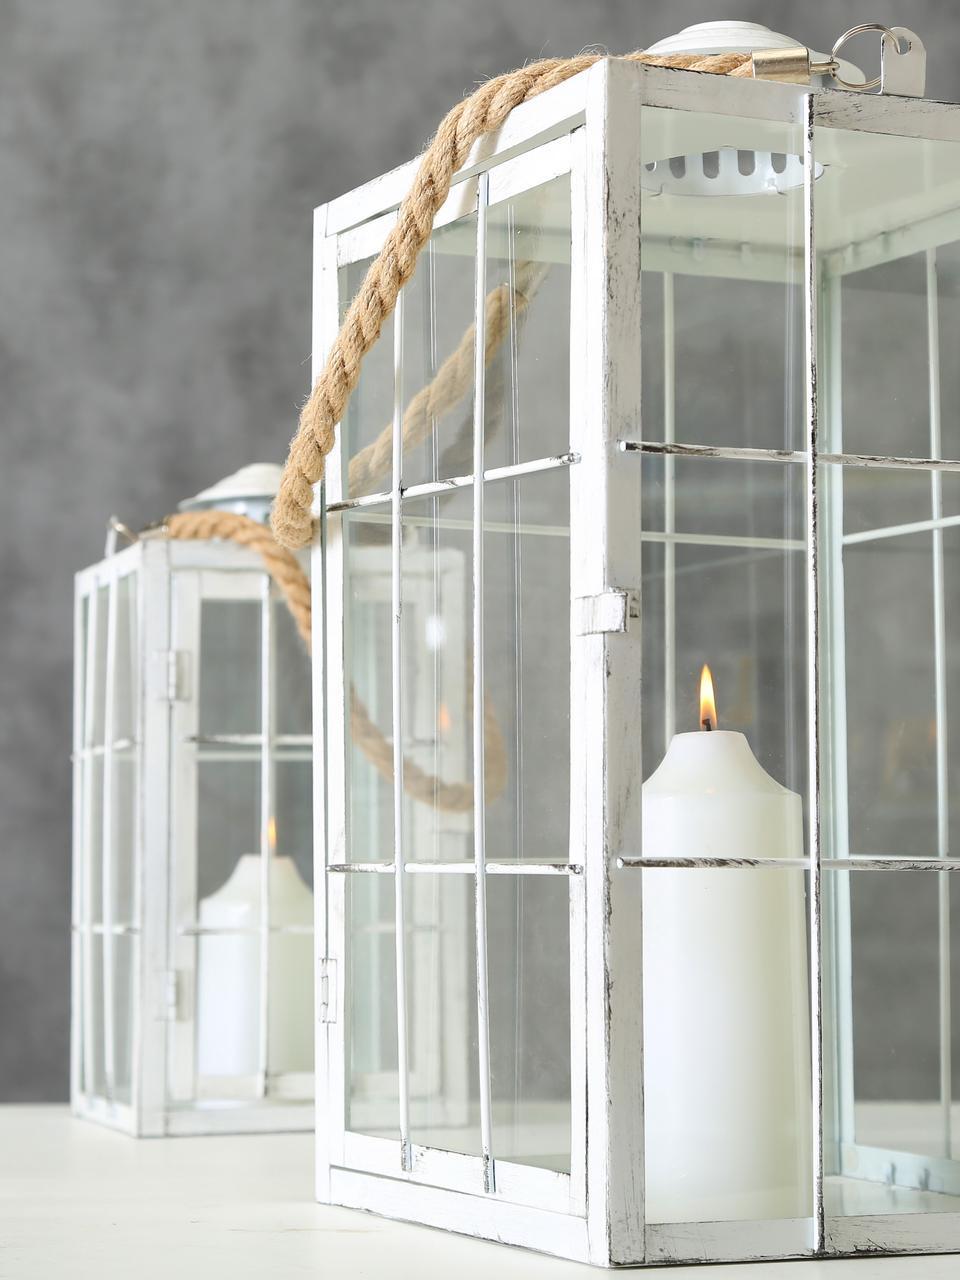 Laternen-Set Barracuda, 2-tlg., Gestell: Metall, beschichtet, Griff: Jute, Weiß, Transparent, Jute, Set mit verschiedenen Größen